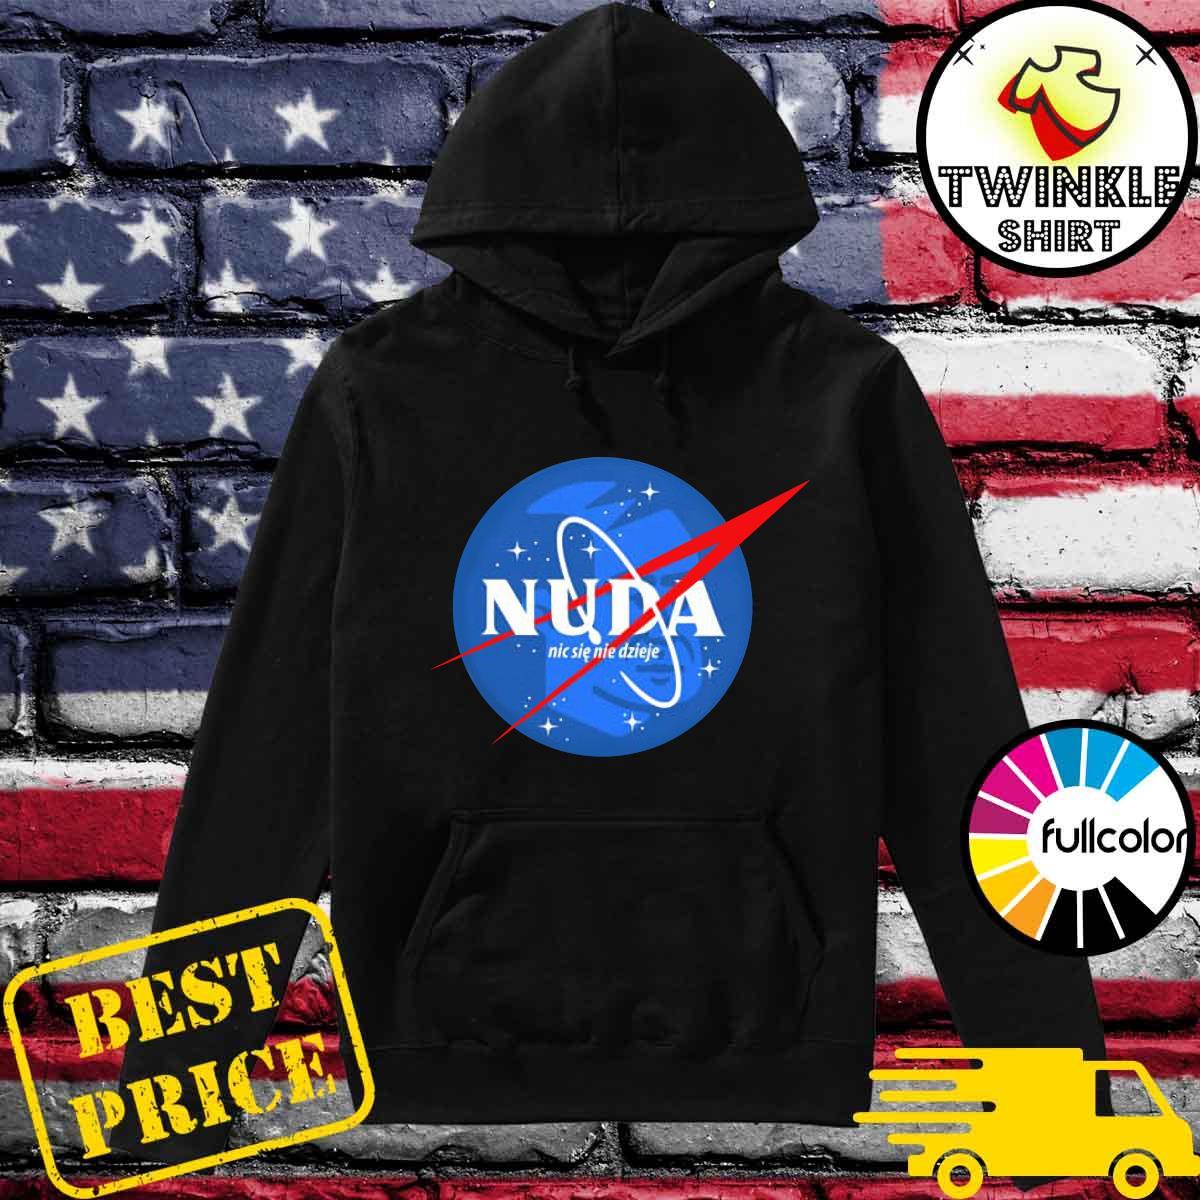 Official NASA Nuda Nic Sie Nie Dzieje Shirt Hoodie